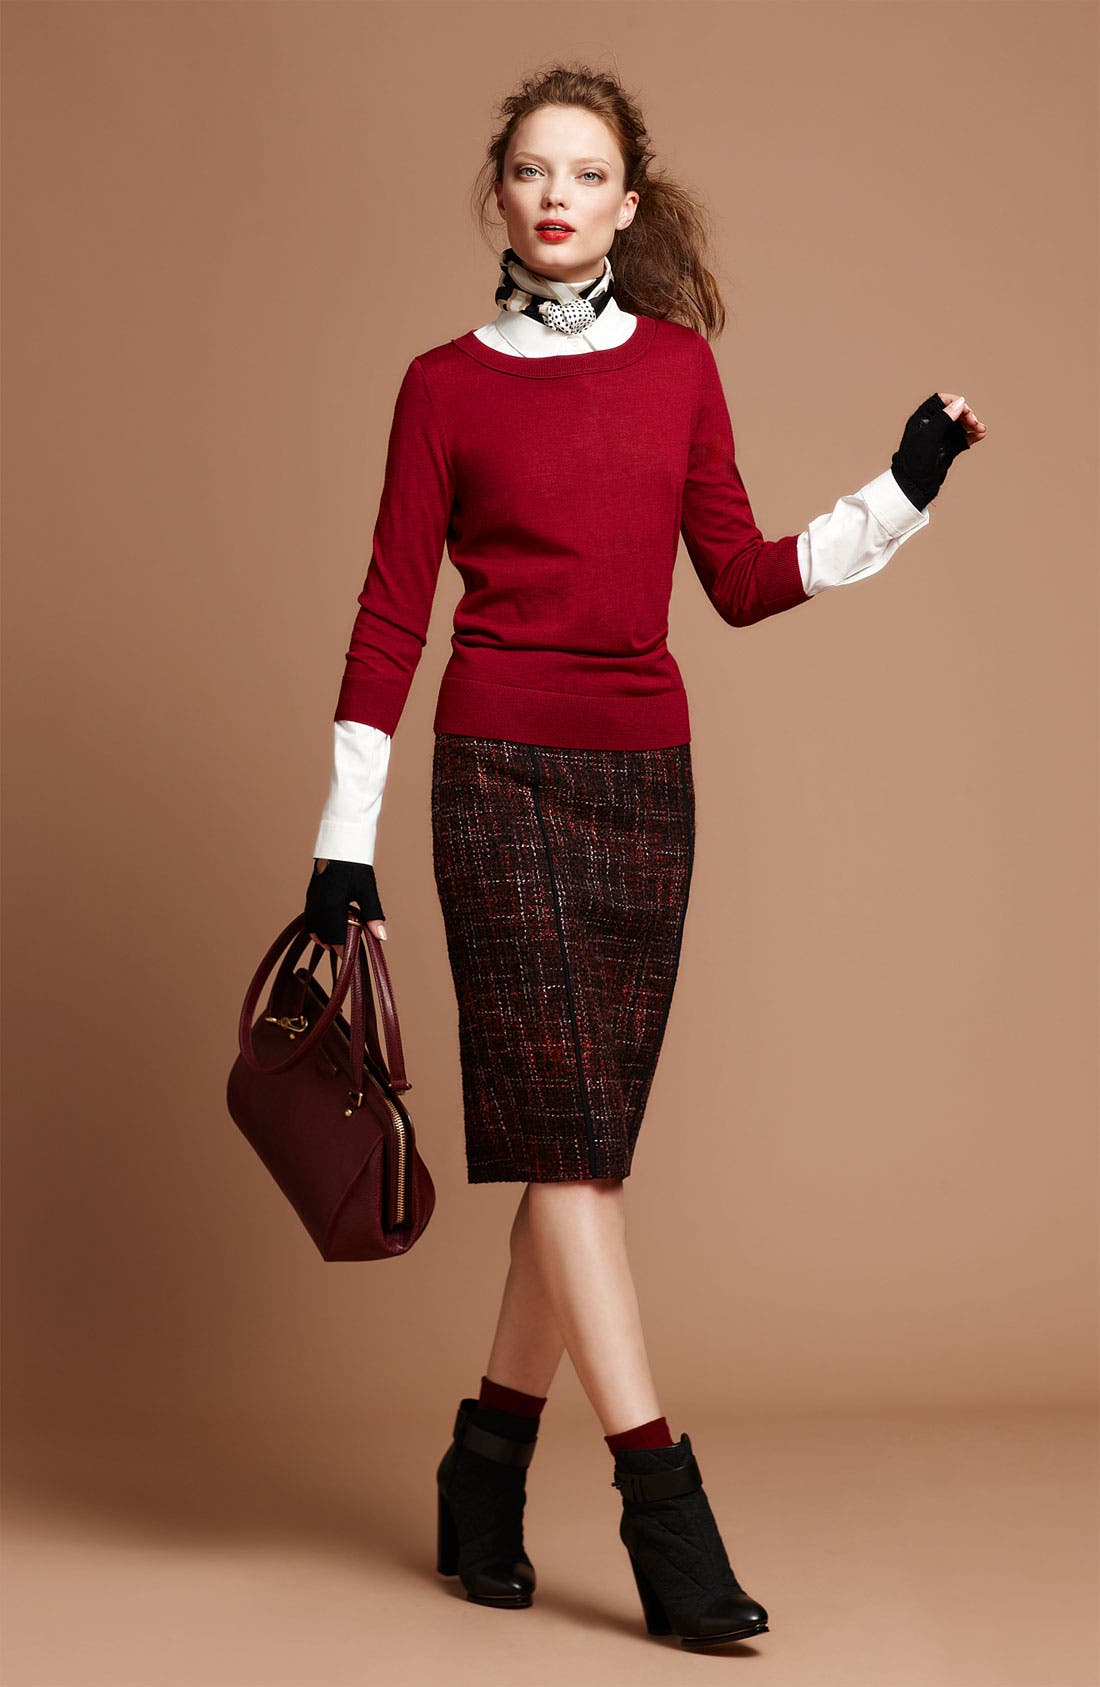 Alternate Image 1 Selected - Halogen® Sweater, Shirt & Skirt